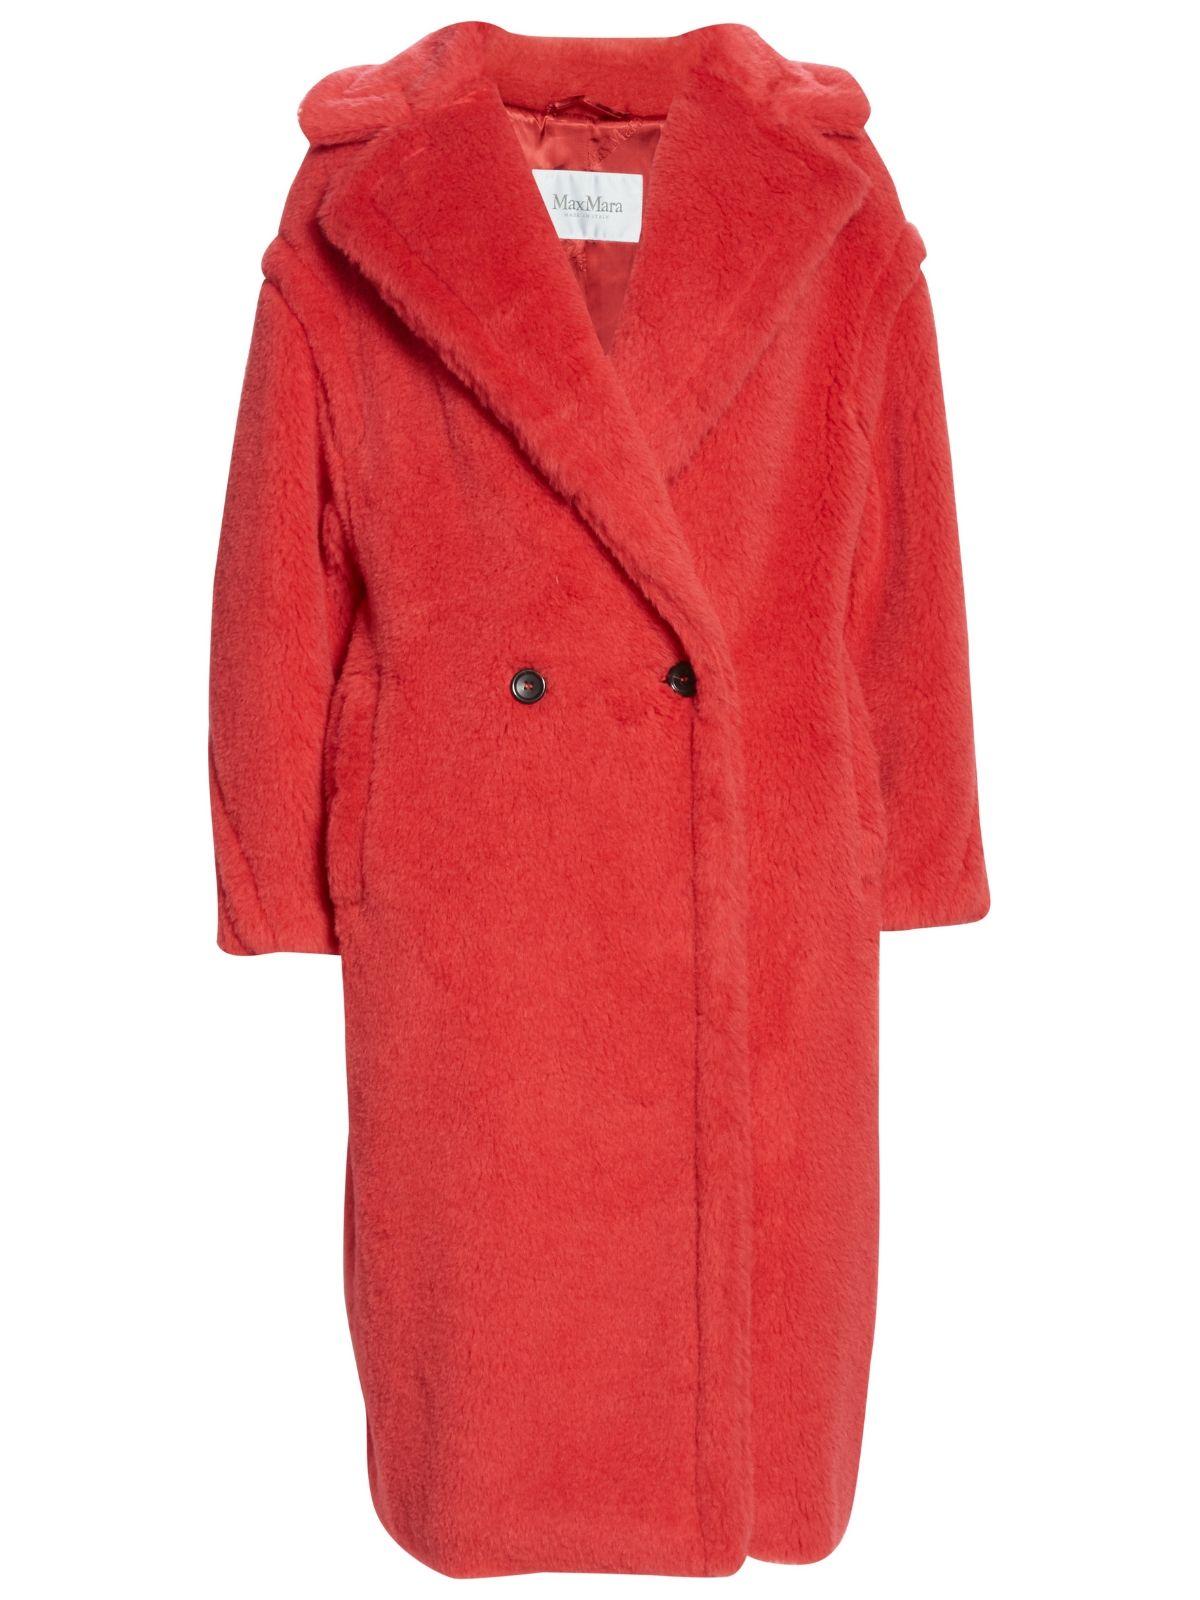 Max Mara Tedgirl Faux-Fur Teddy Bear coat